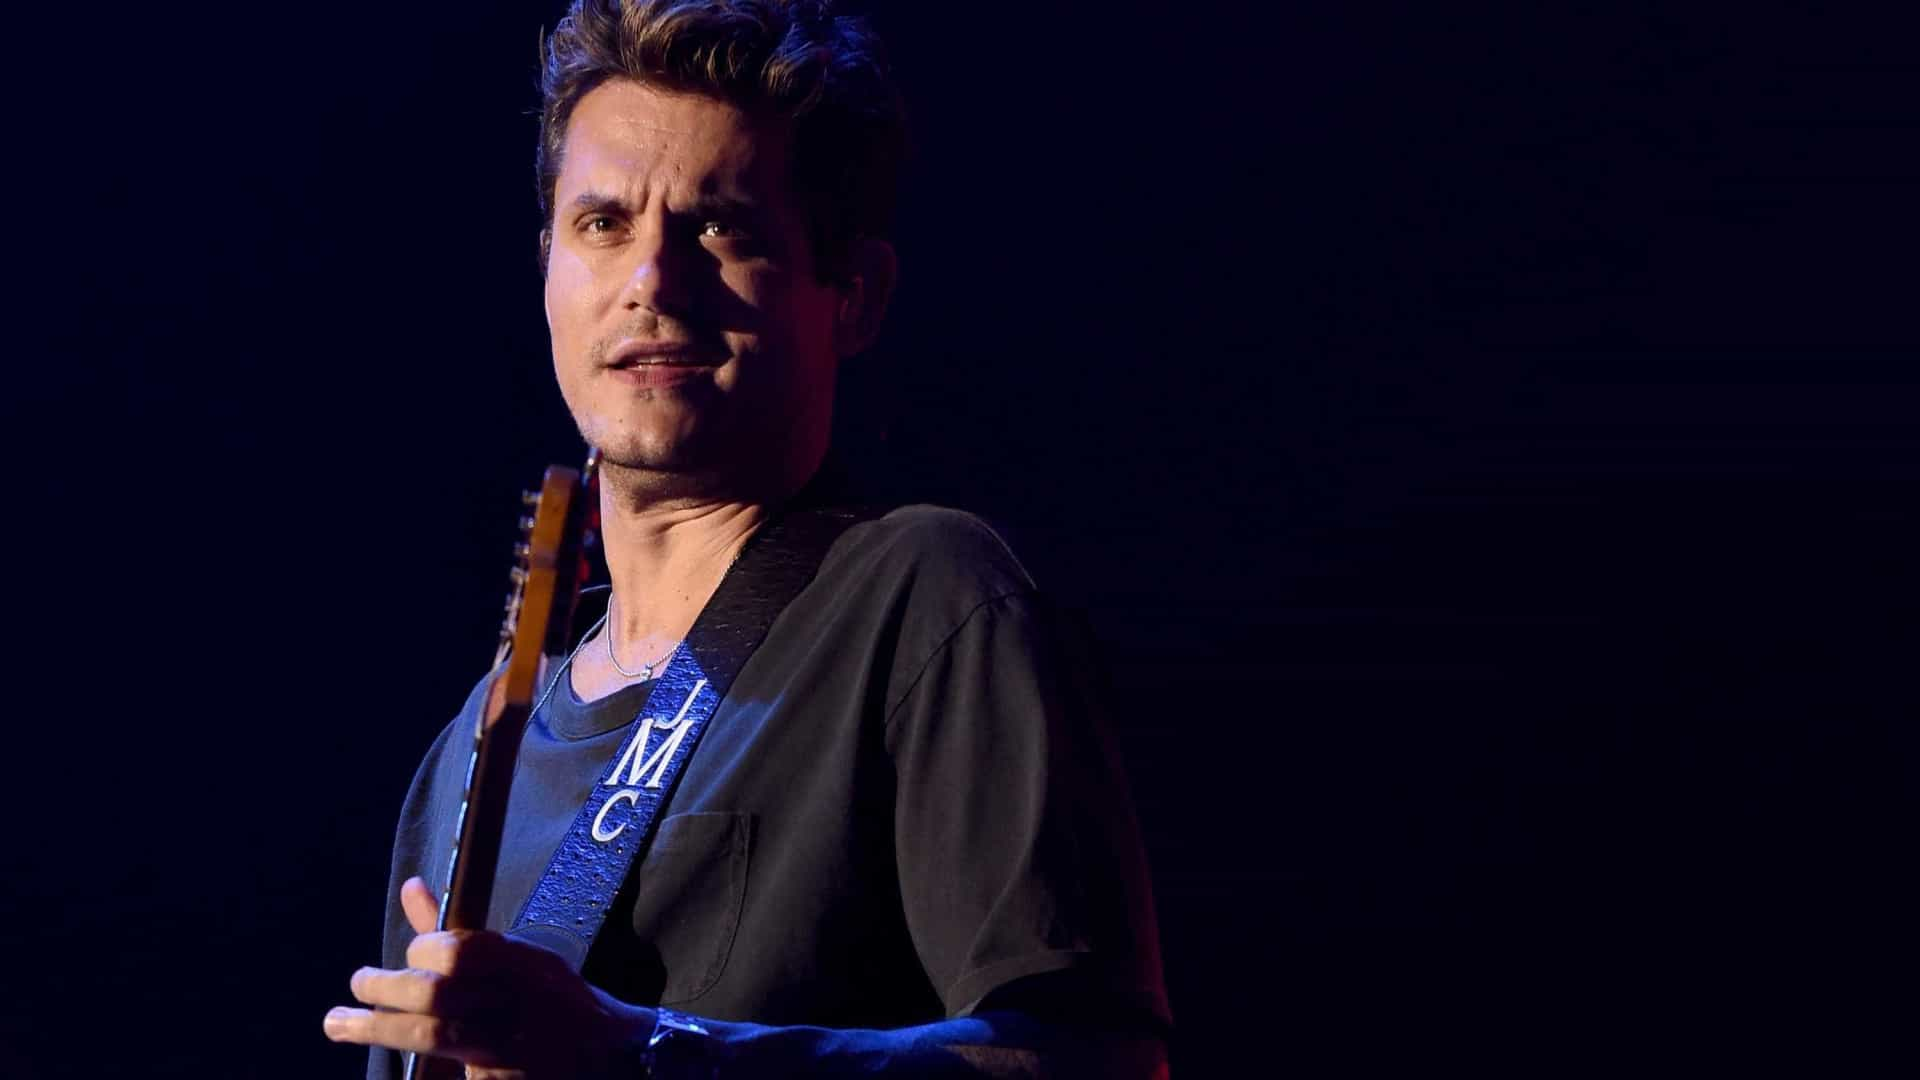 John Mayer é internado para fazer cirurgia de apendicite emergencial